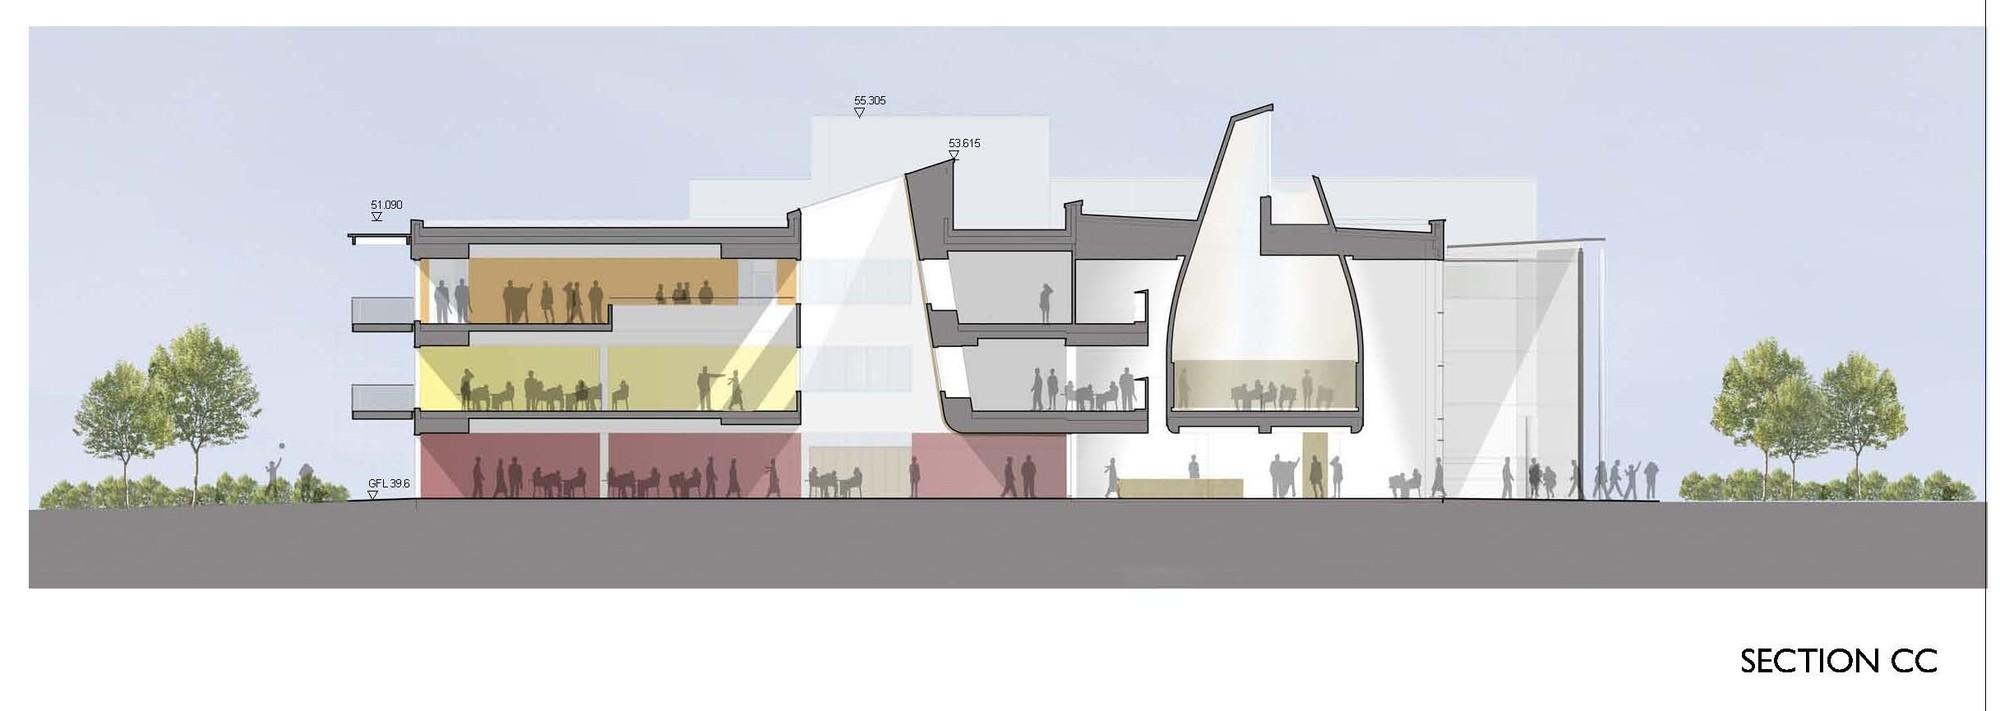 All Saints' Academy / Nicholas Hare Architects